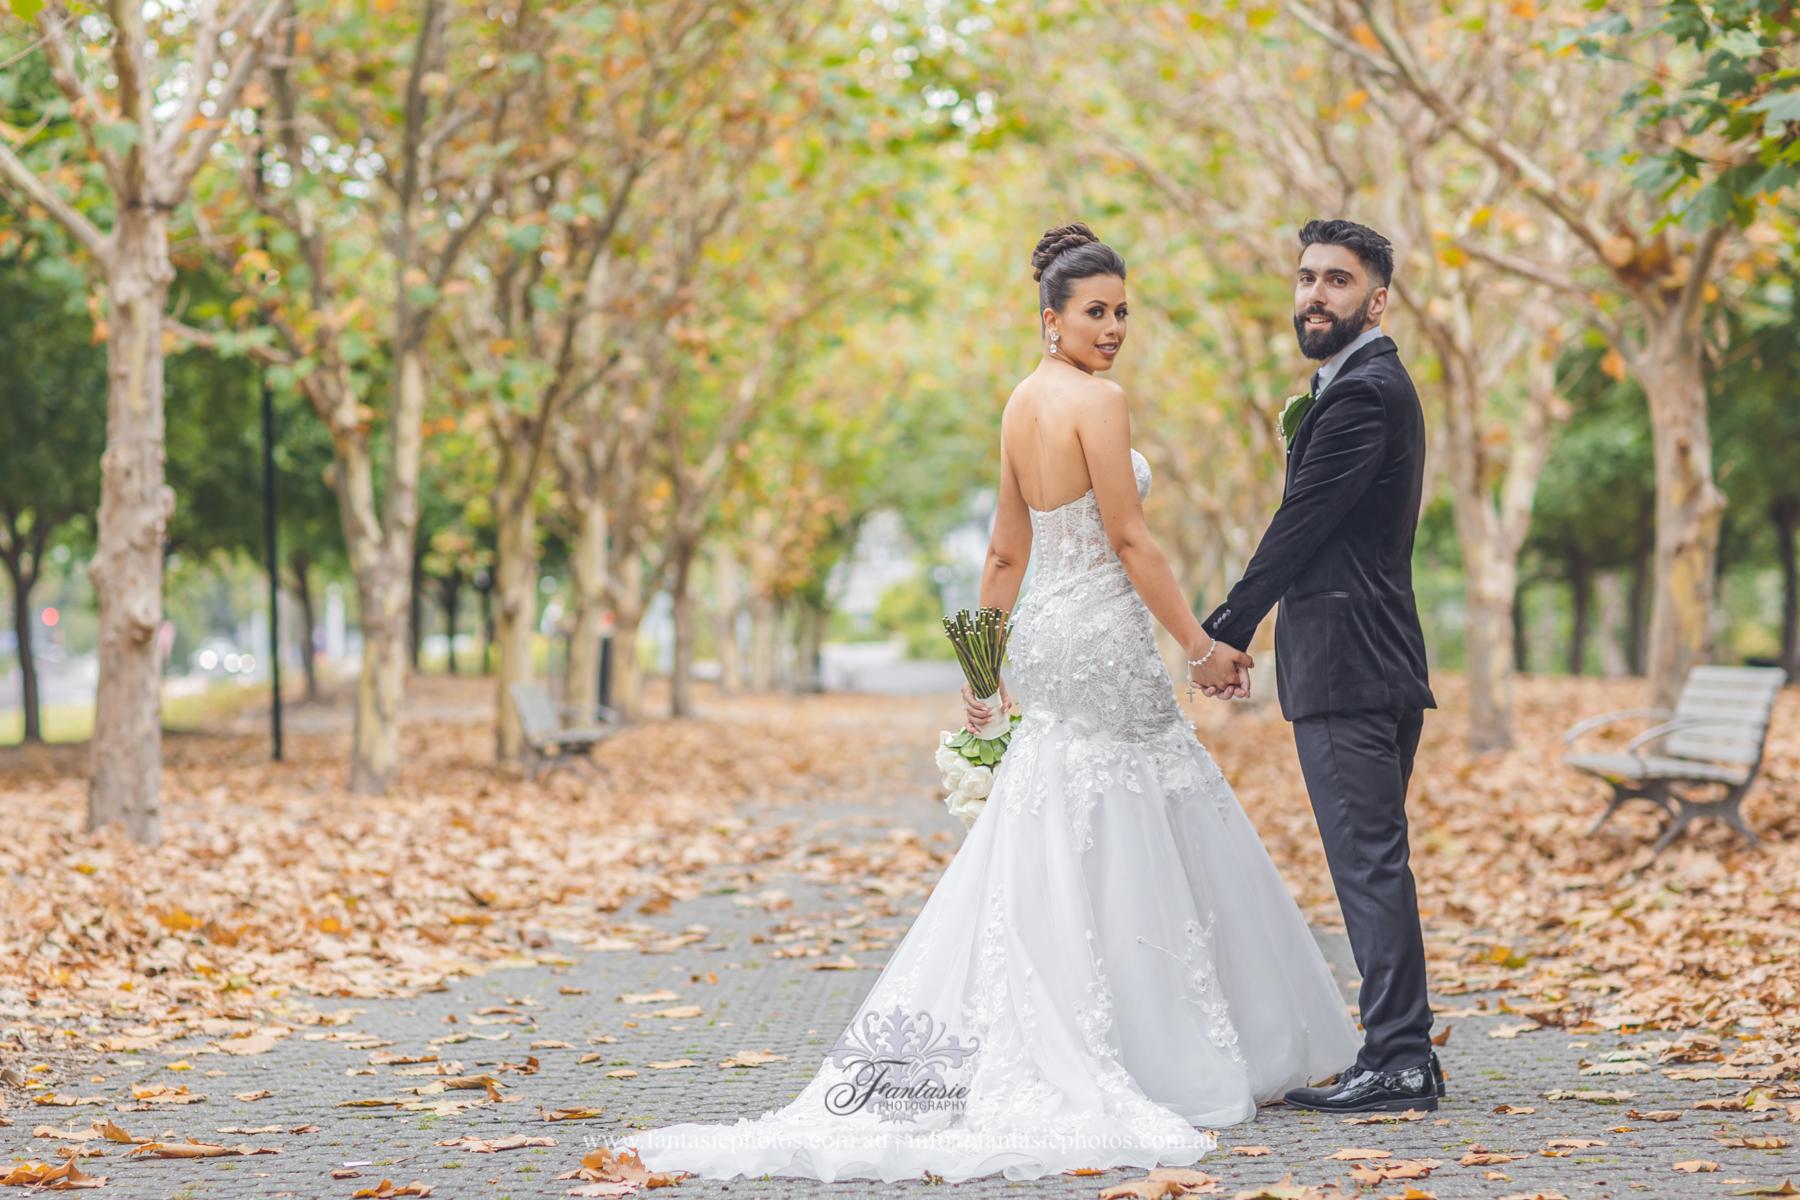 Wedding Photography Waterview Bicentennial Park | Fantasie Photography